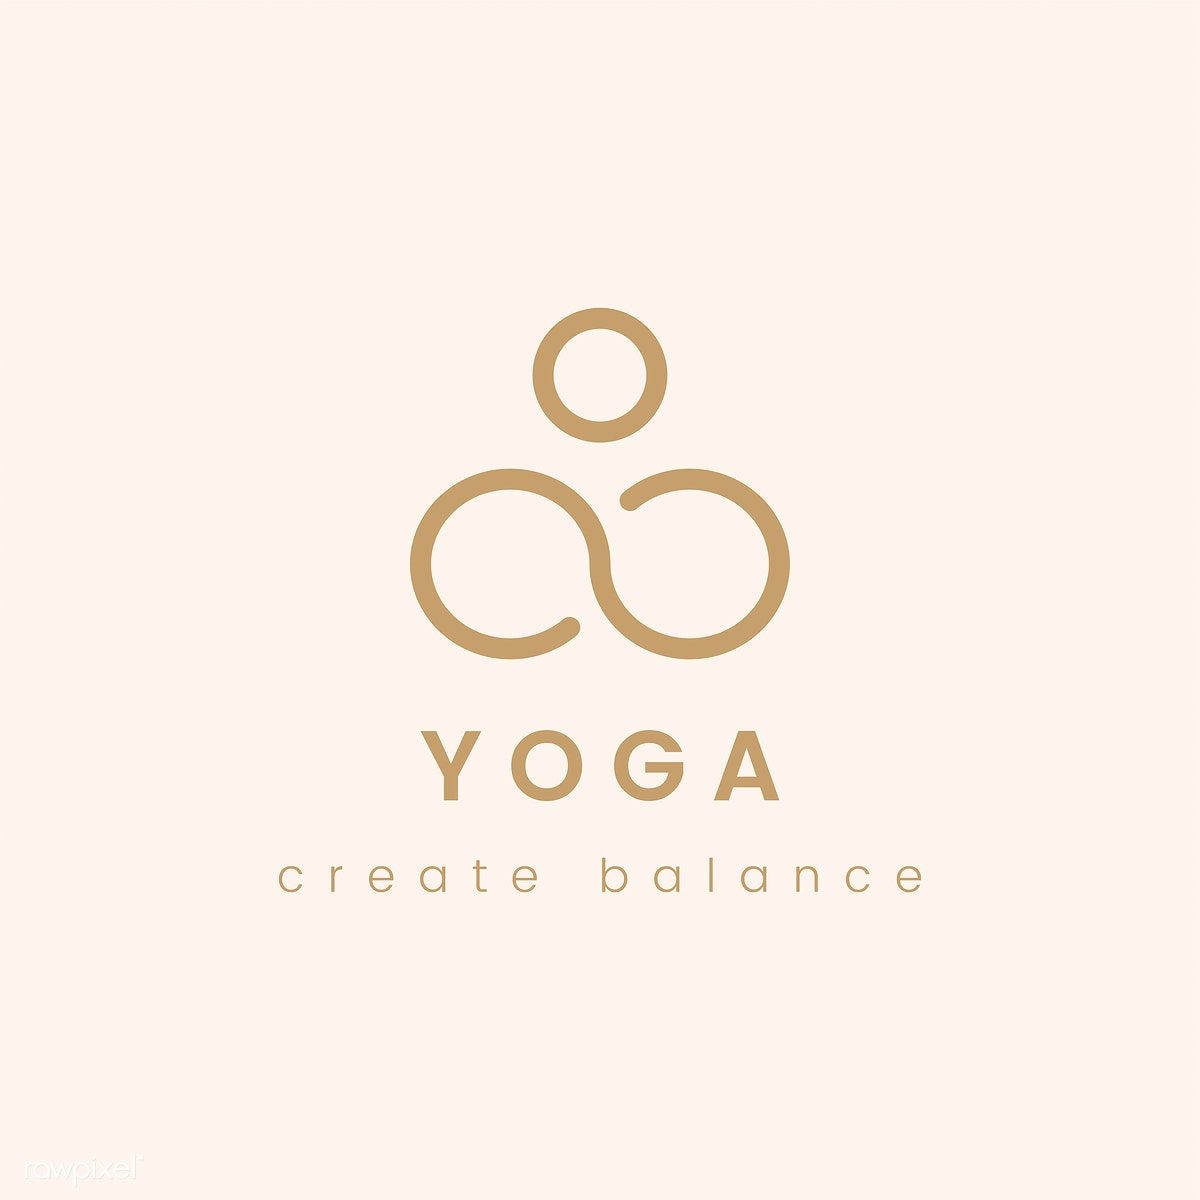 Download Free Vector Of Design Of Yoga Create Balance Logo Vector By Ningzk V About Yoga Yoga Studio Ad Advertisemen Yoga Logo Design Yoga Logo Logo Design